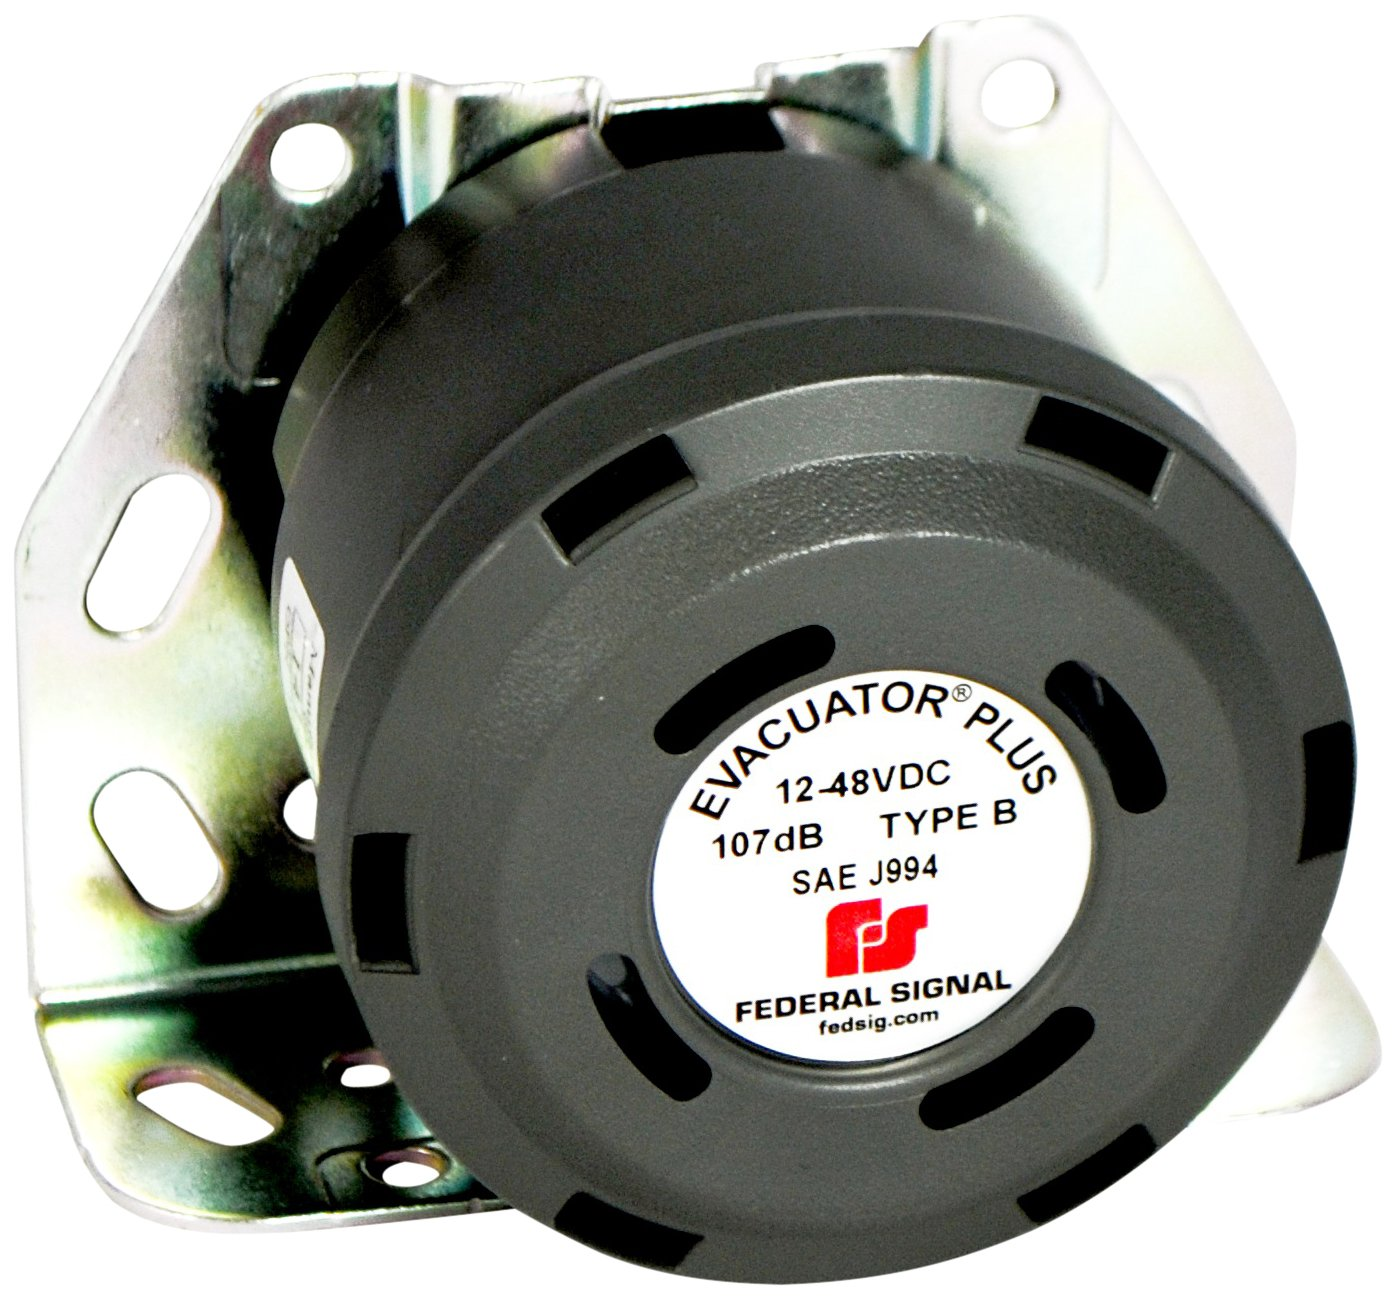 Federal Signal 201333SSG Evacuator Back-Up Alarm, Dual Function Universal Mount by Federal Signal